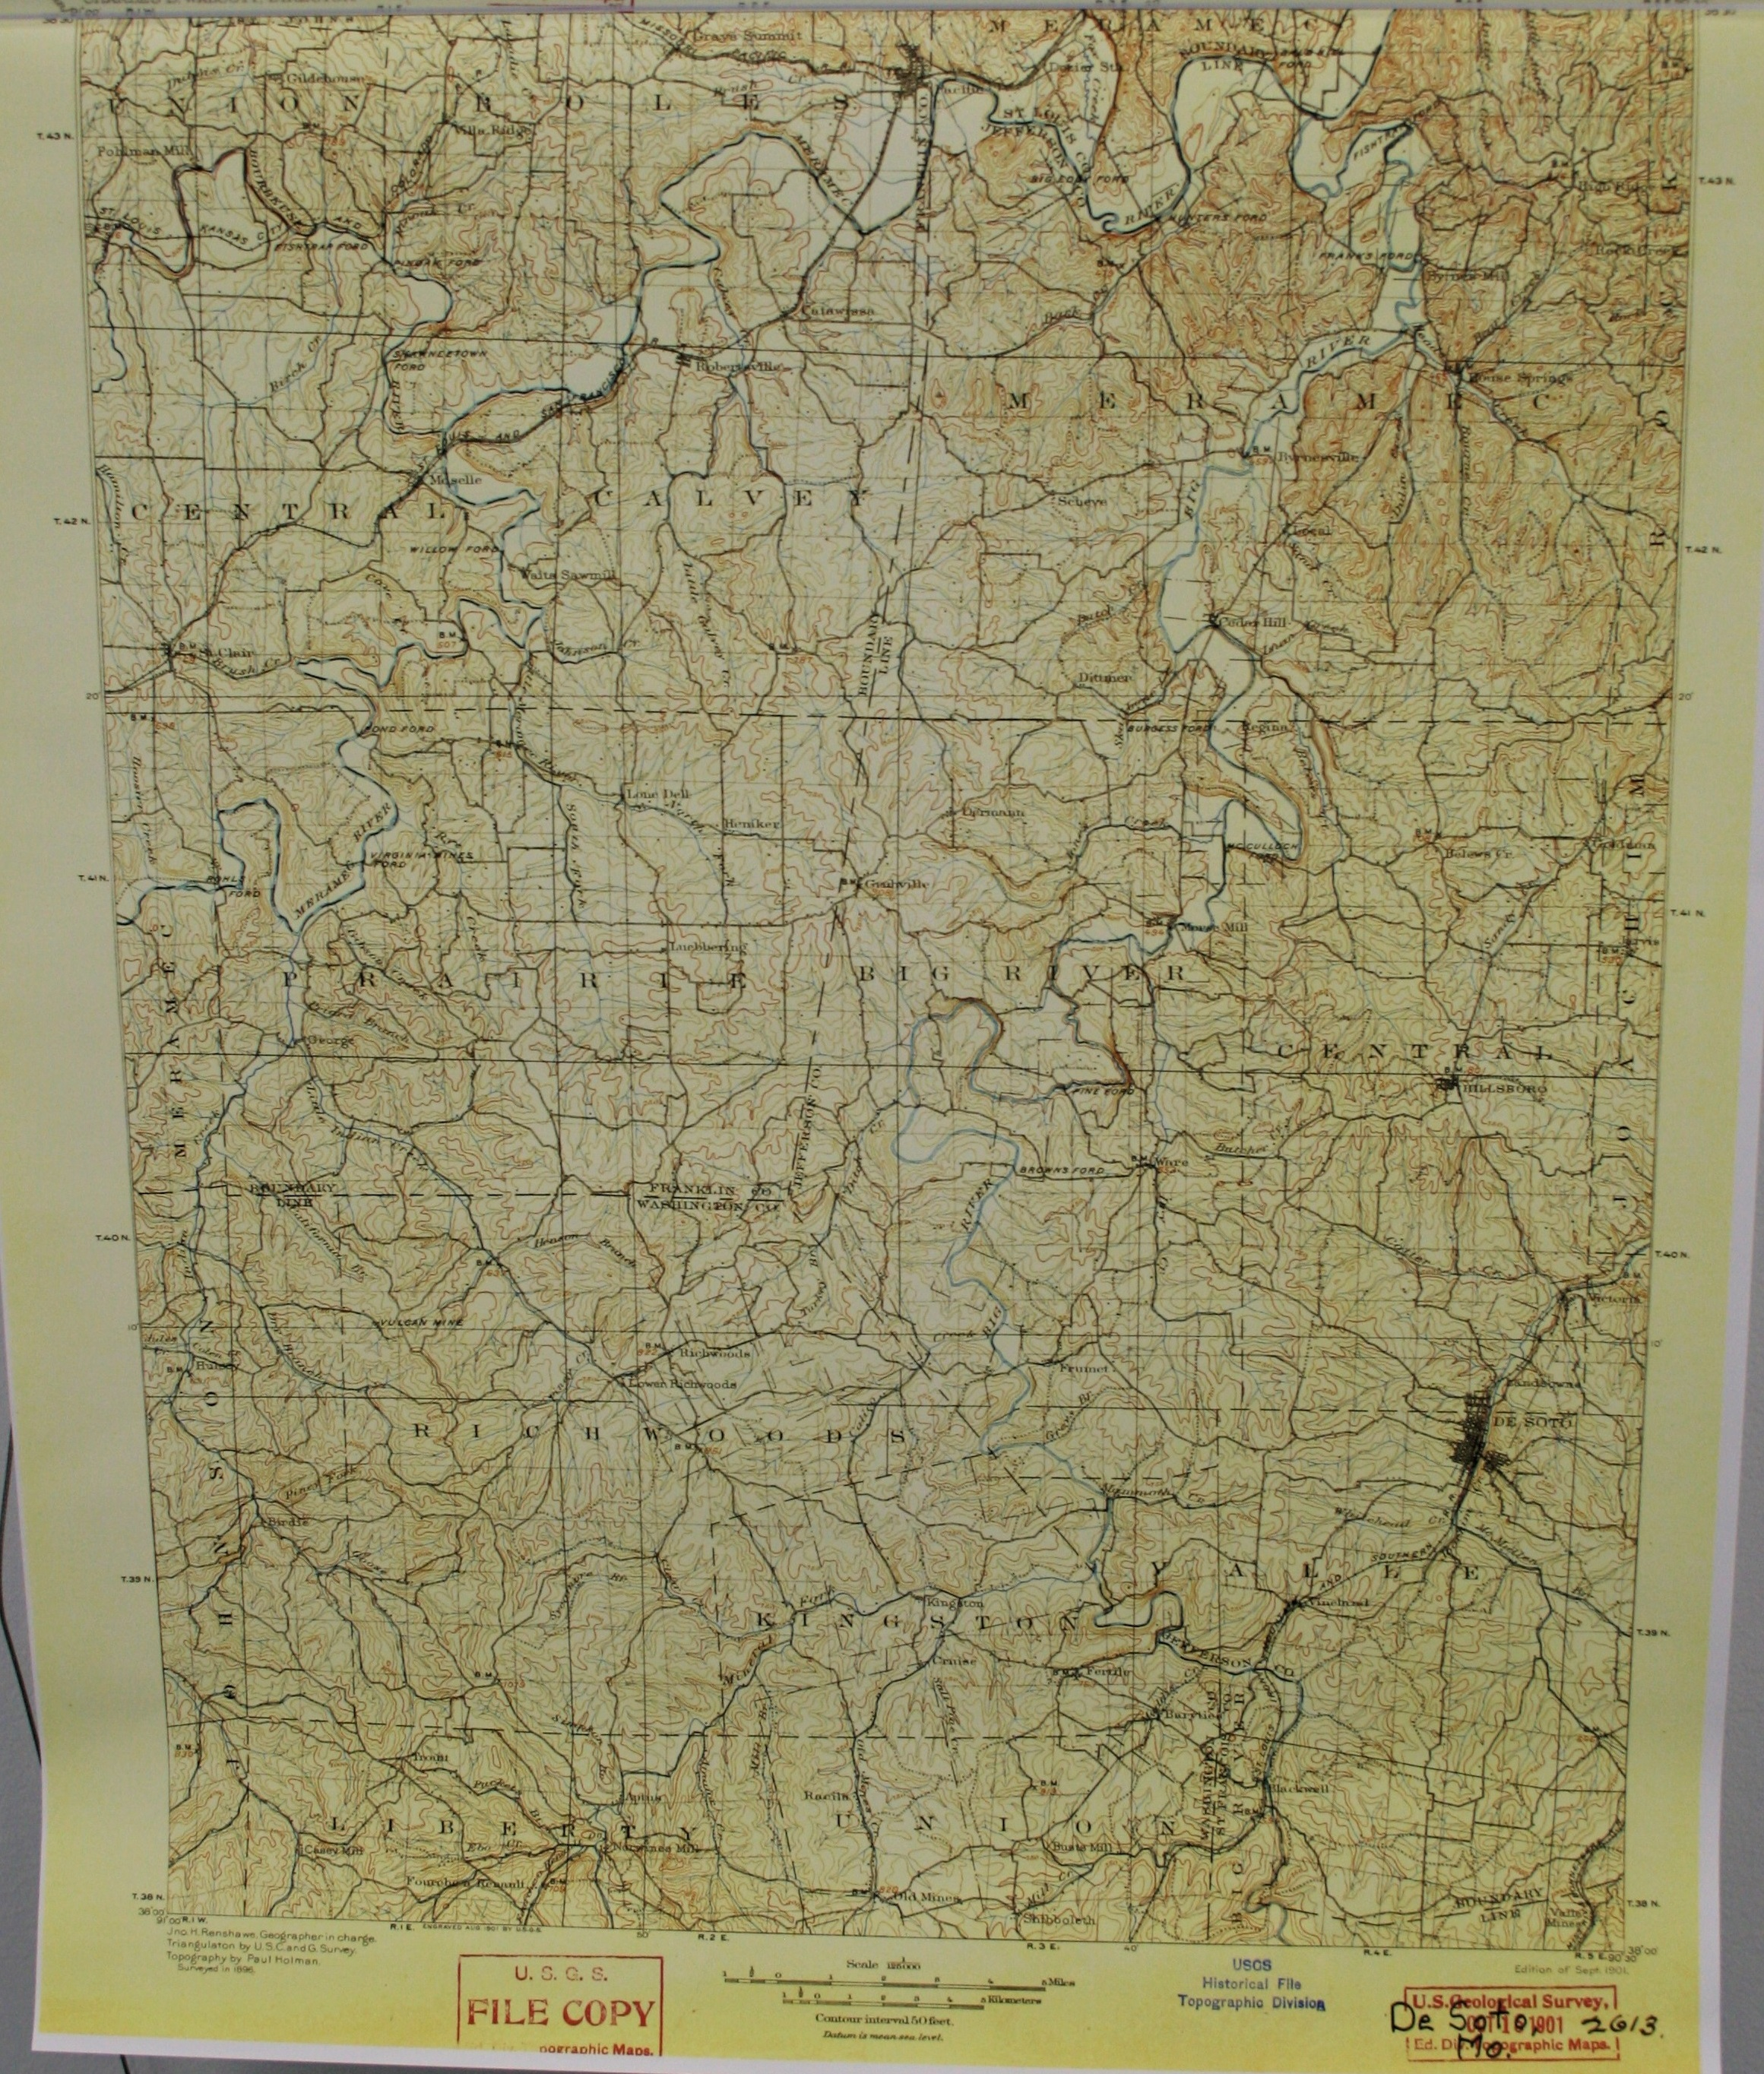 Image of USGS Map of De Soto Missouri Quad 1901